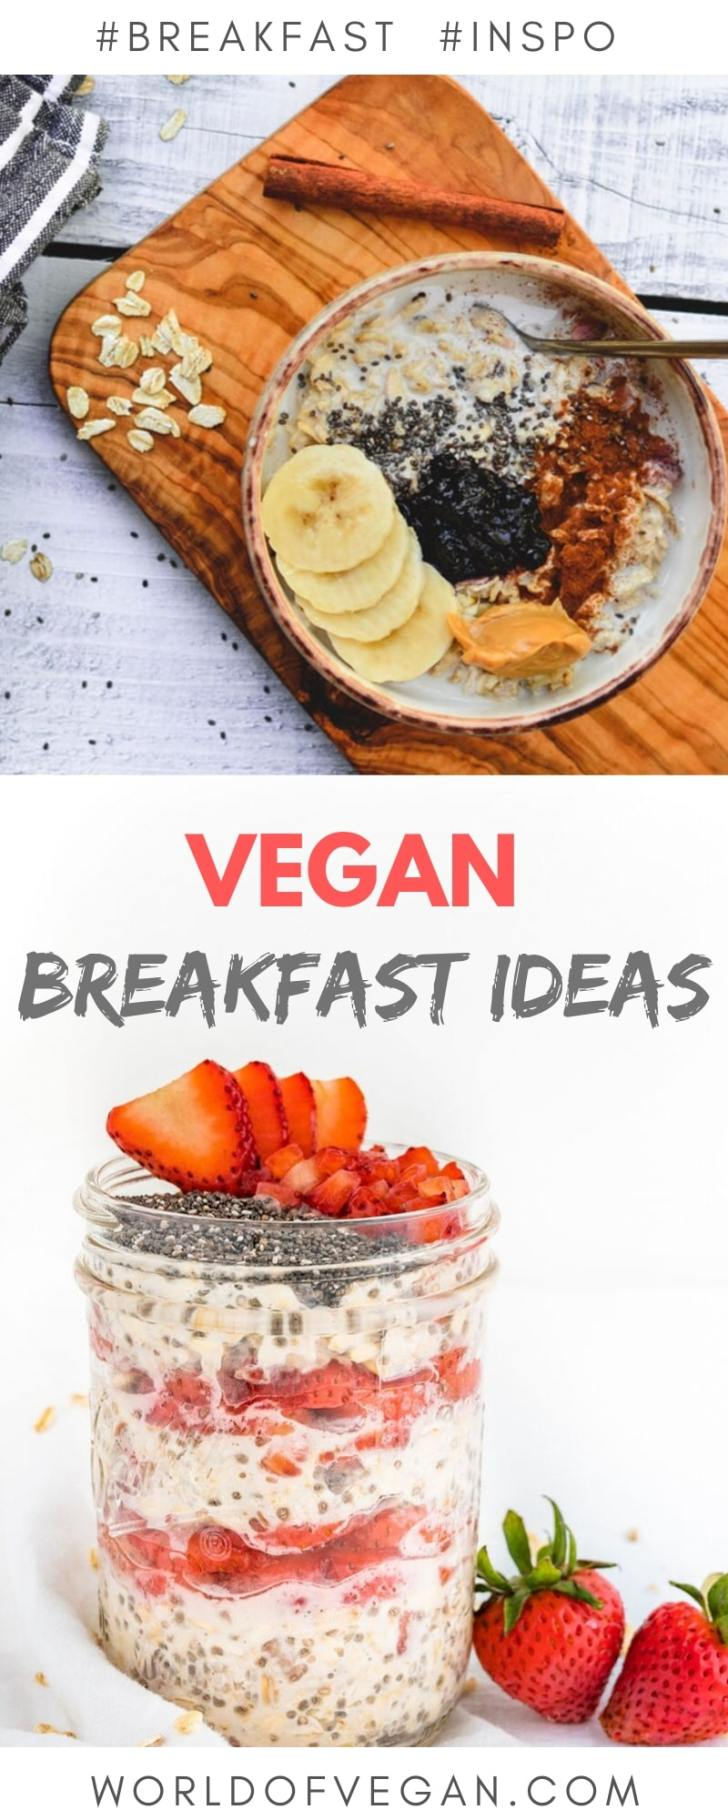 10 Easy Vegan Breakfast Ideas To Get Out of a Rut | WorldofVegan.com